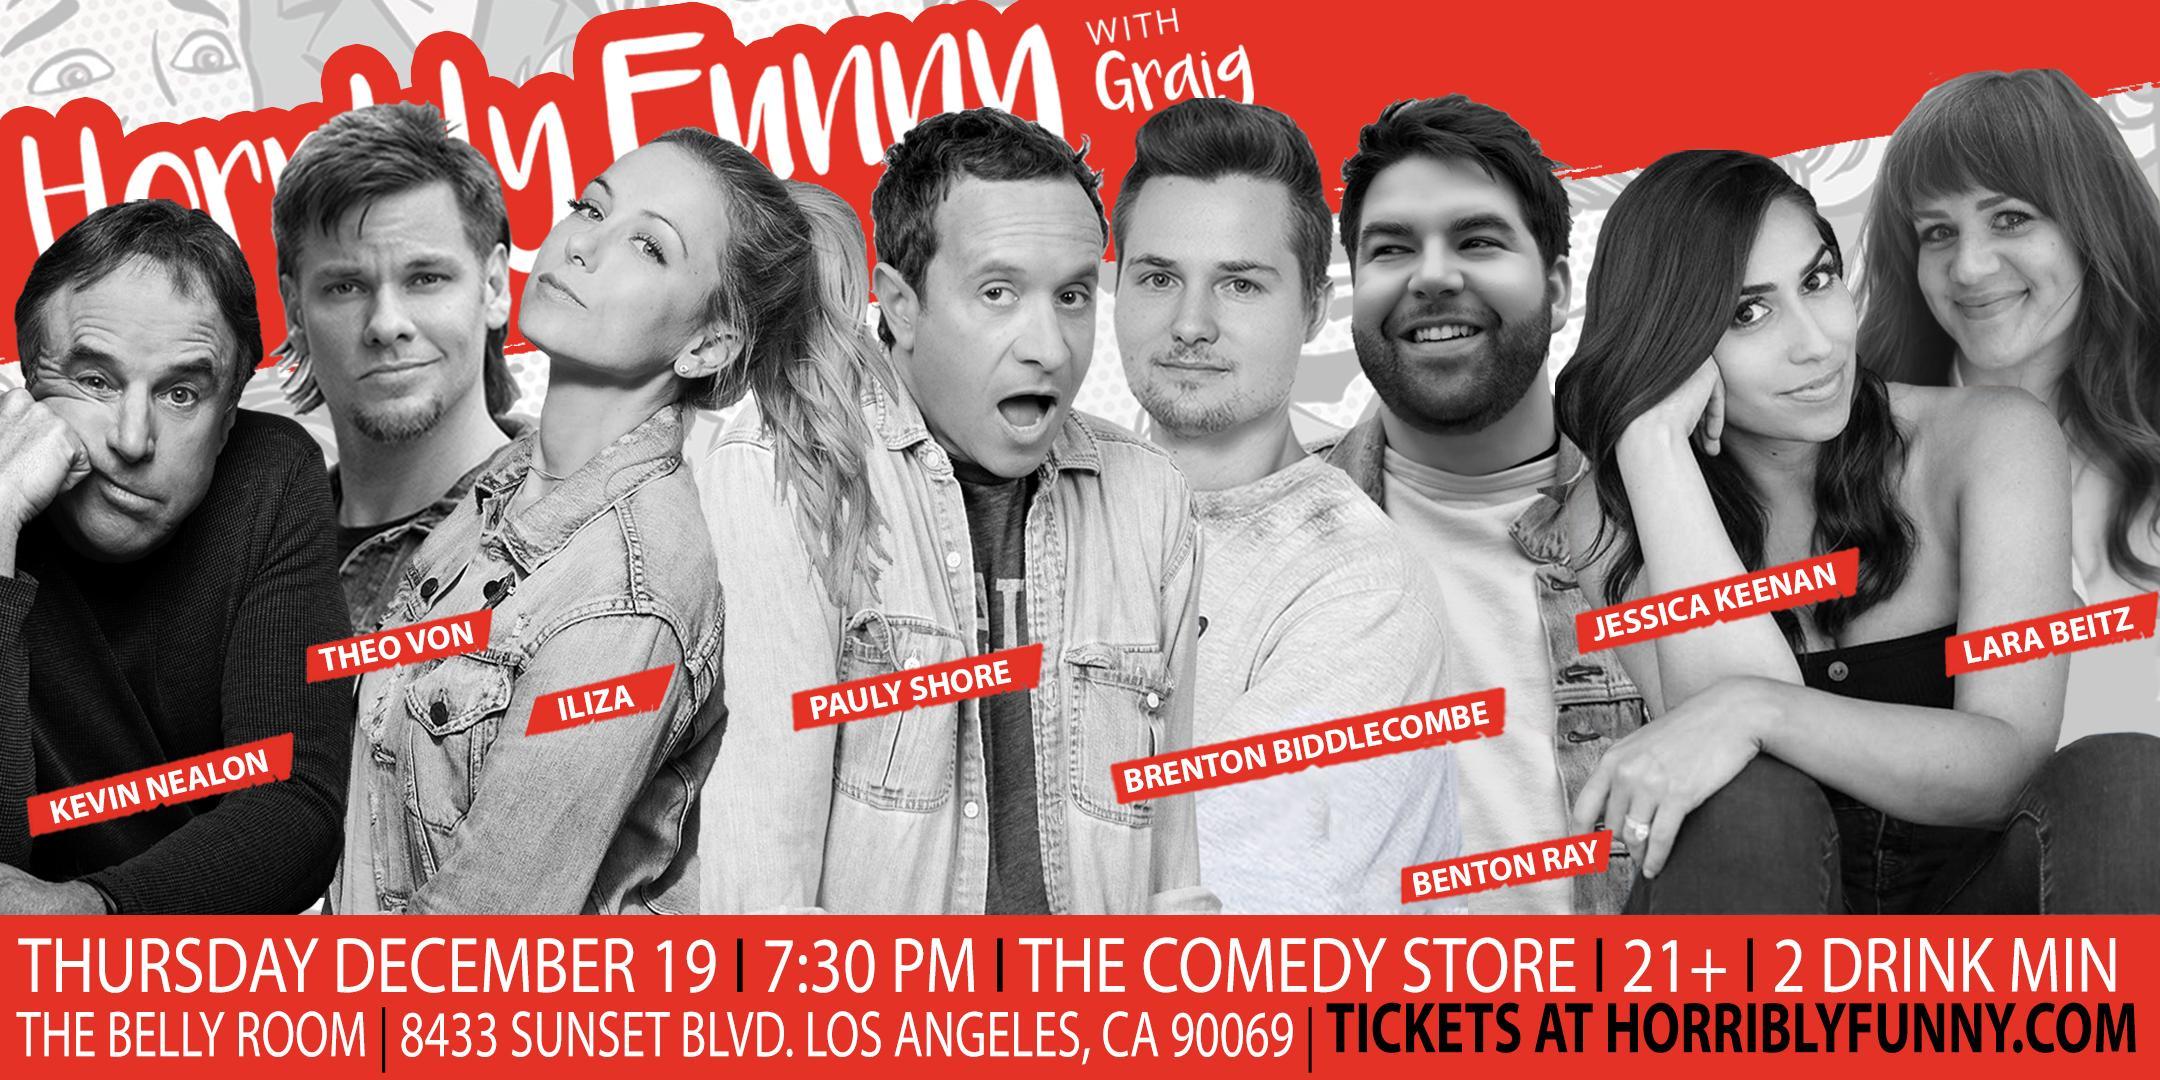 Horribly Funny- Theo Von, Kevin Nealon, Iliza, Pauly Shore & More!